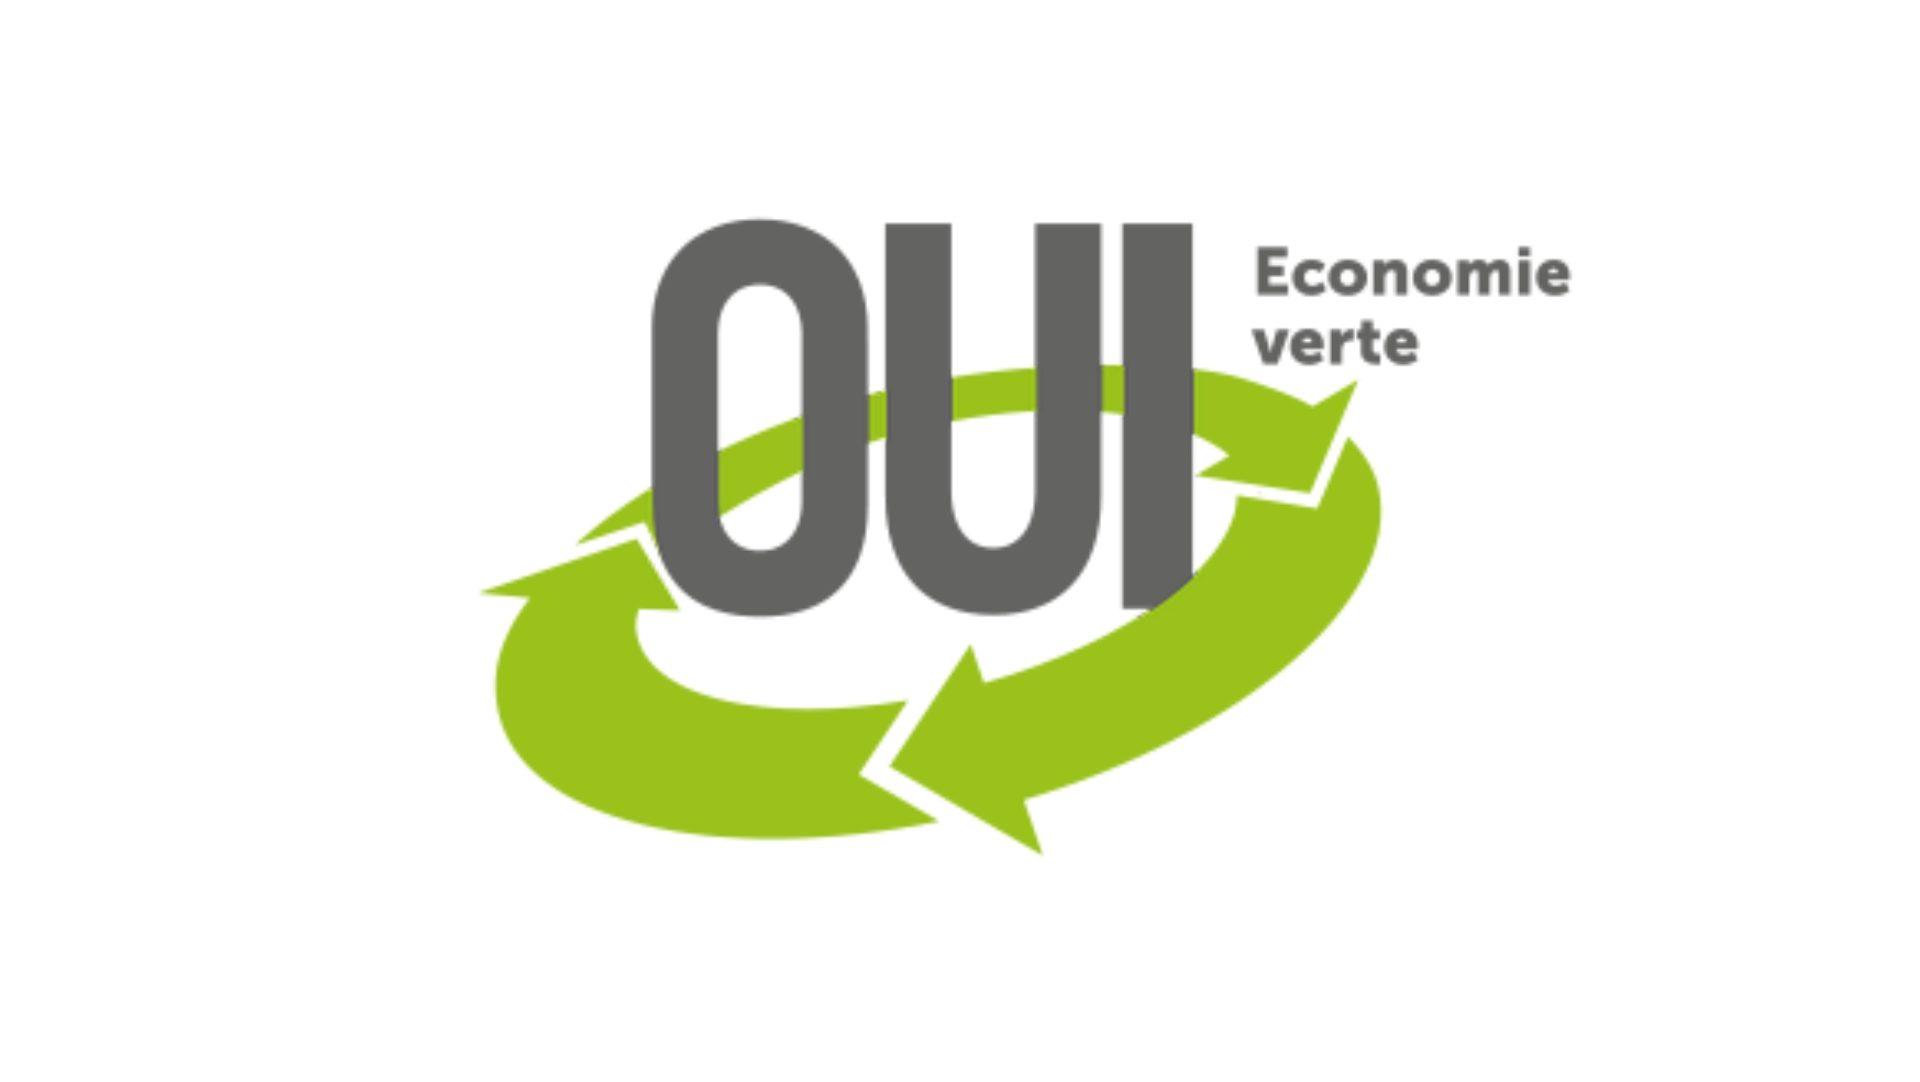 suisse  alliance sud soutient l u0026 39 initiative pour une  u00abeconomie verte u00bb  u2013  u00c9glise catholique suisse